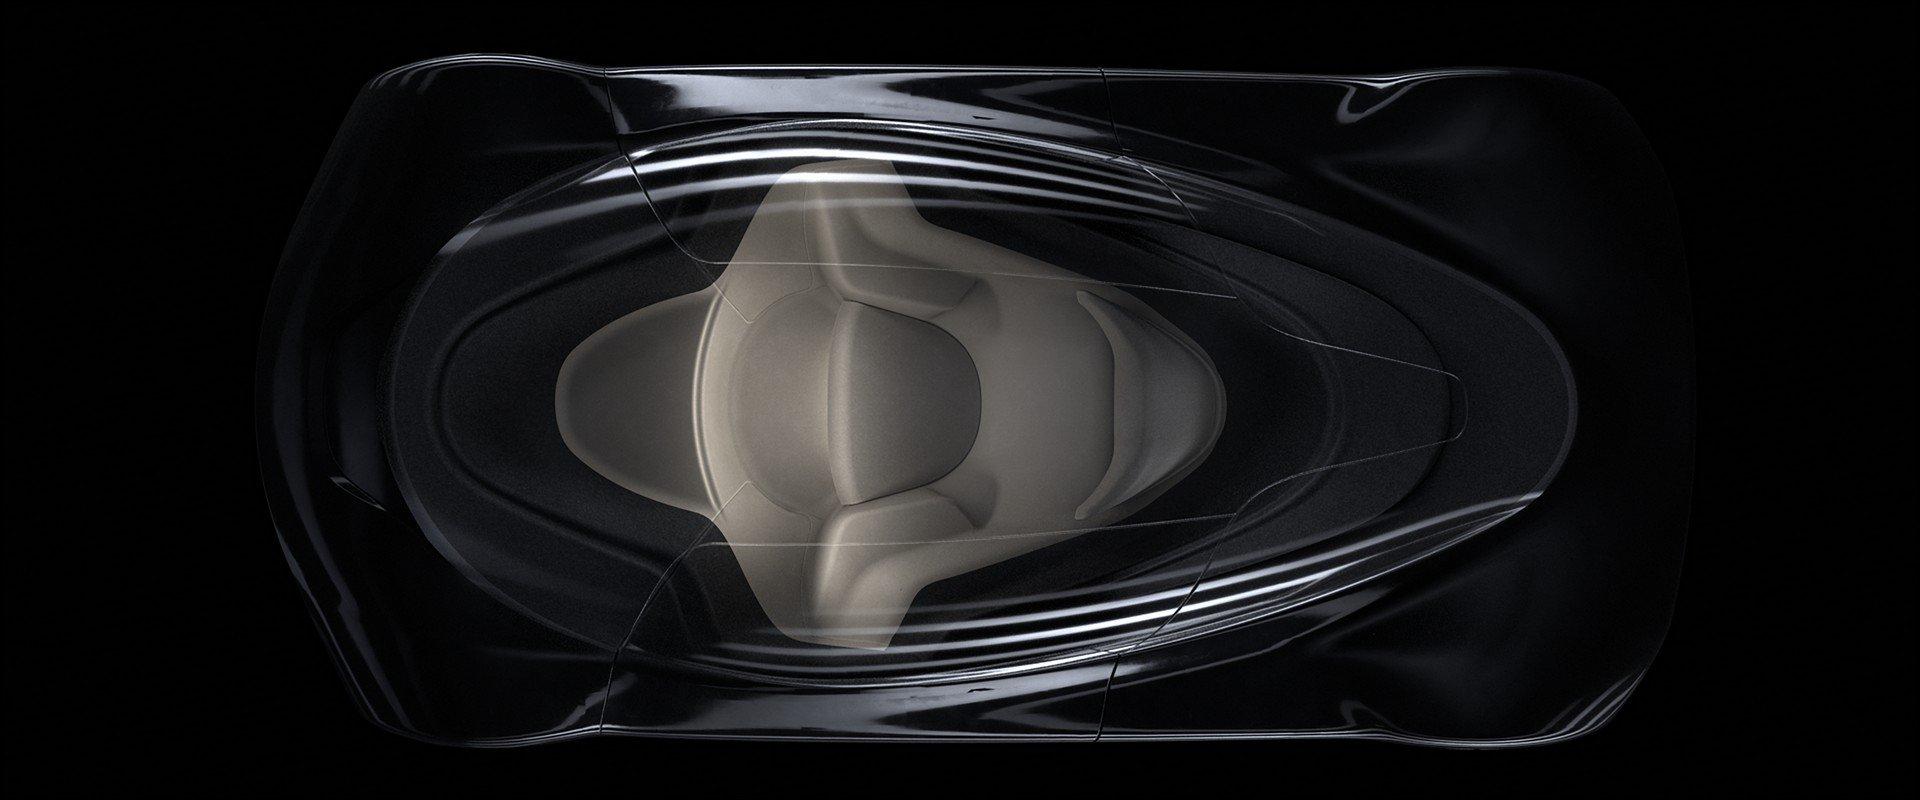 Bentley Future Cars 2050 (2)